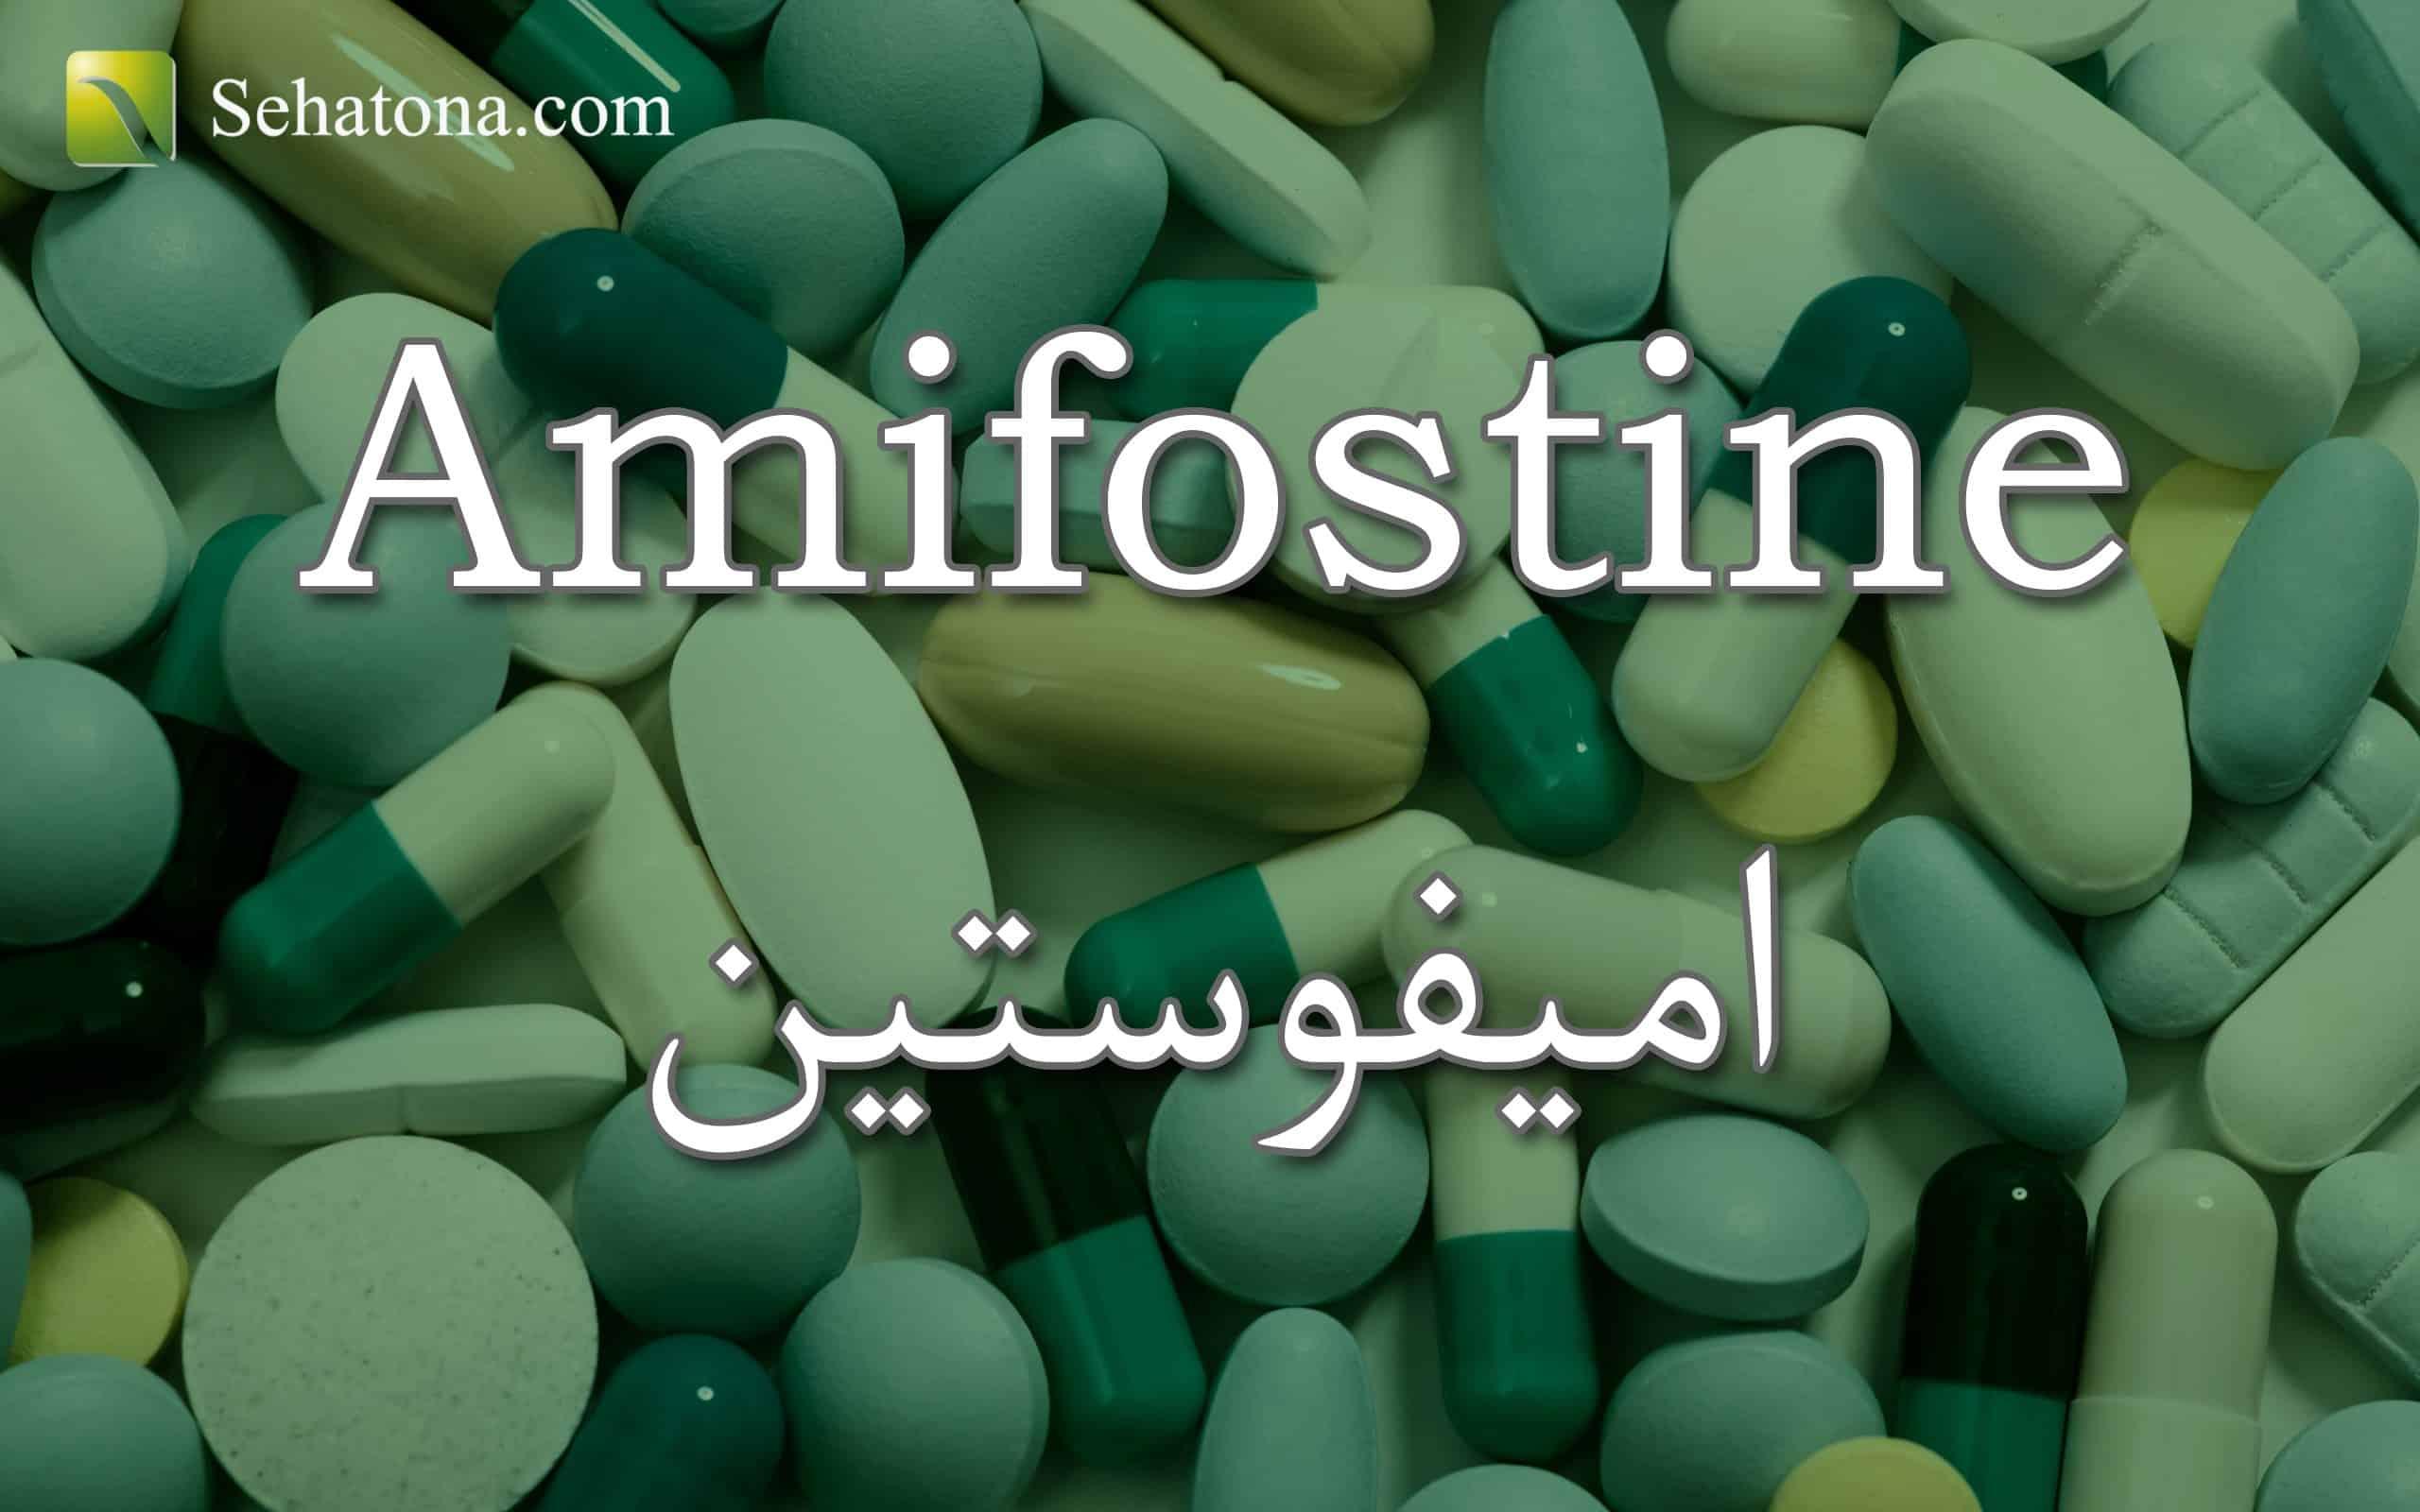 Amifostine